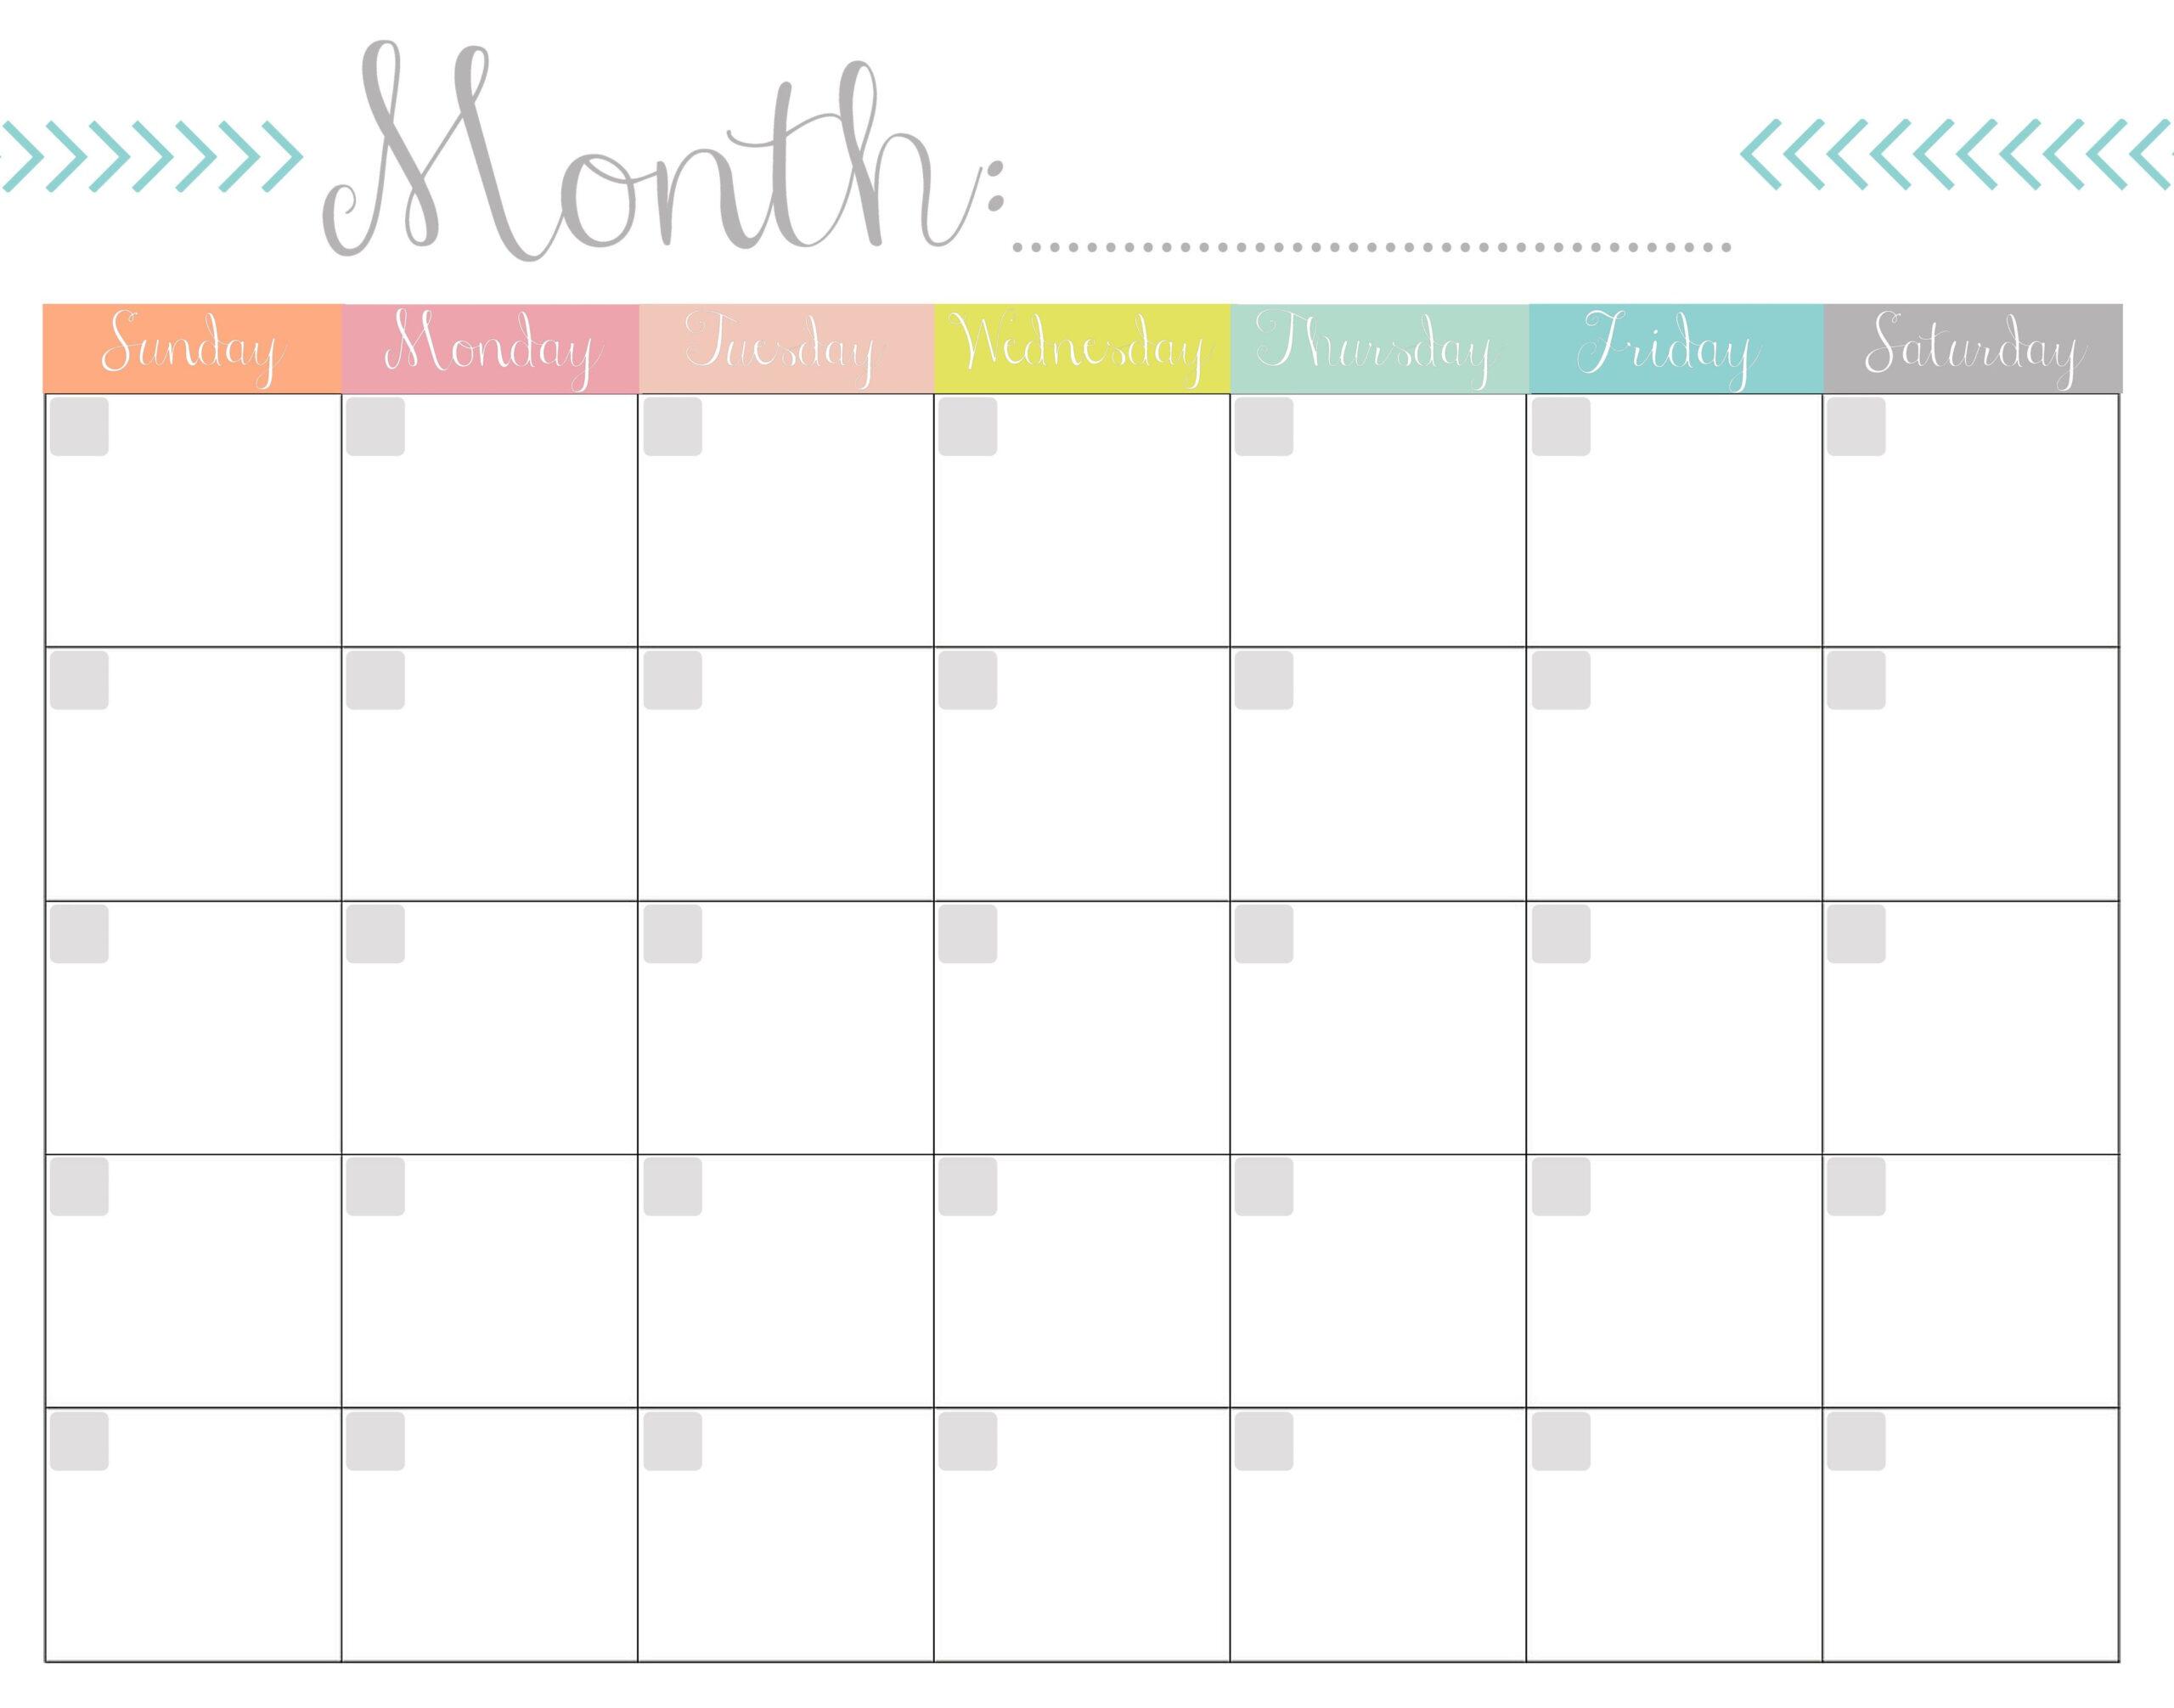 Monthly Calendar Free Printable Free Printable Calendar within Free Monthly Calendar Printable And Editable